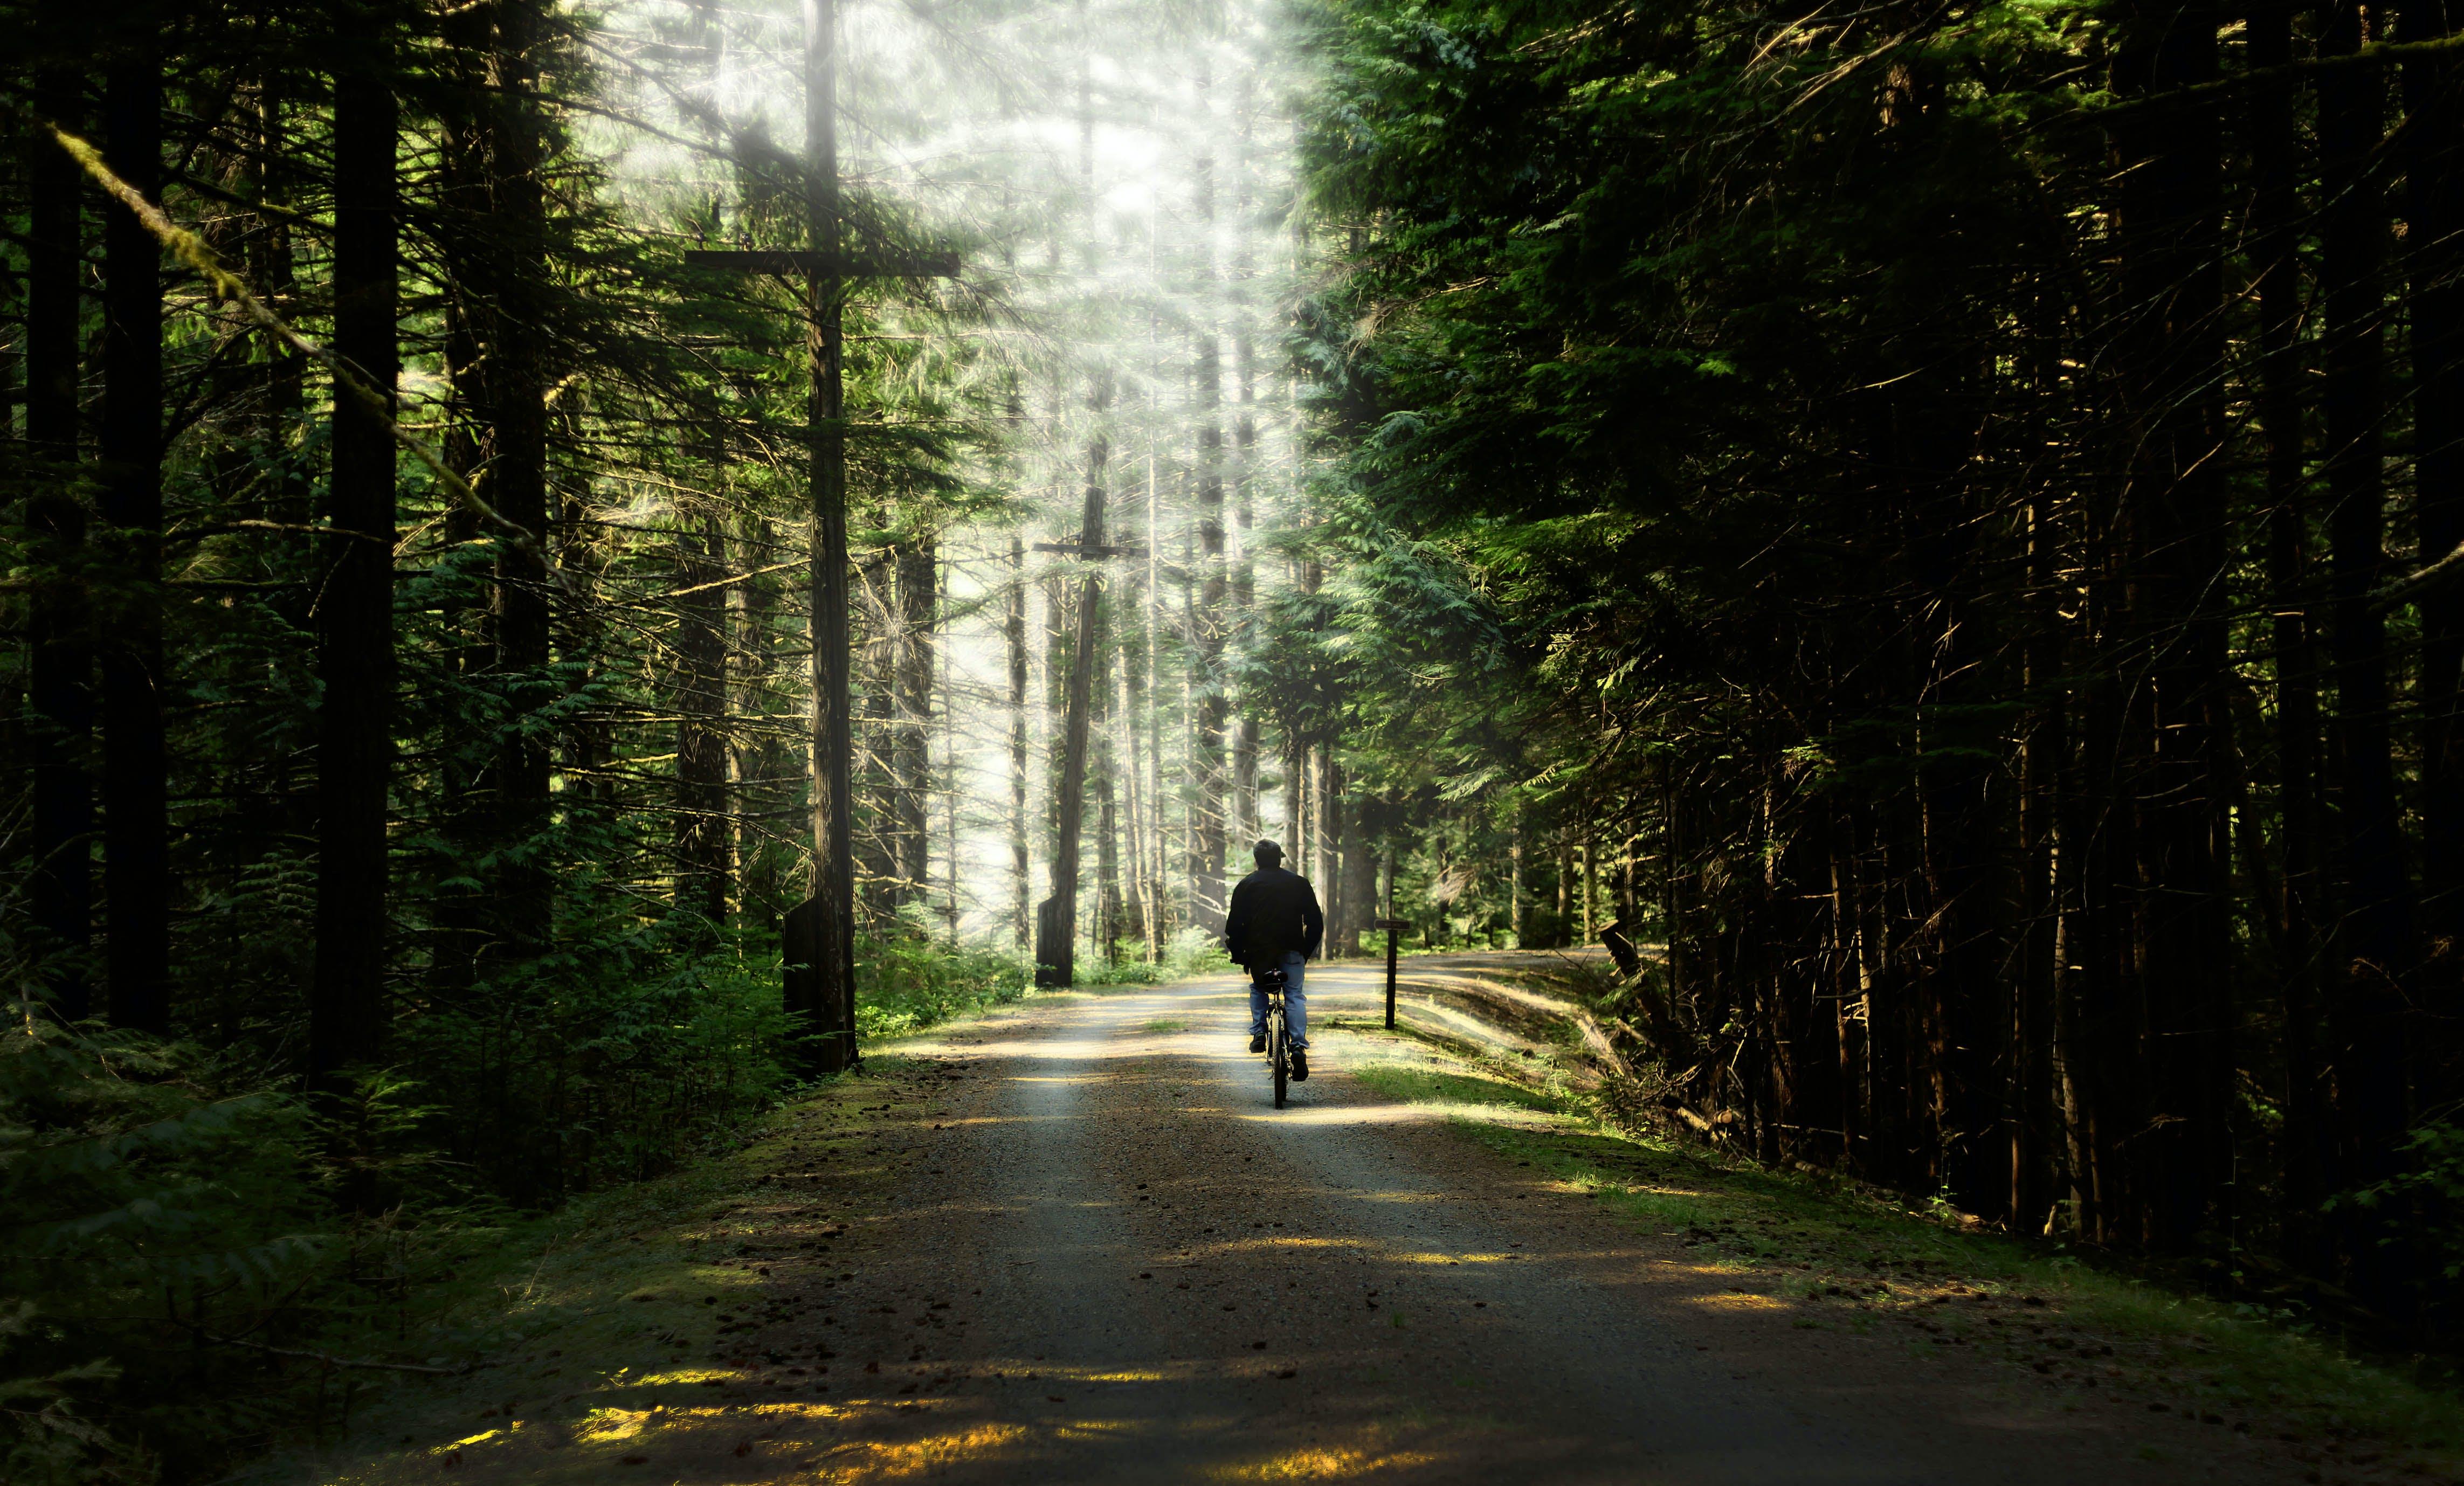 Kostenloses Stock Foto zu bäume, holz, person, pfad